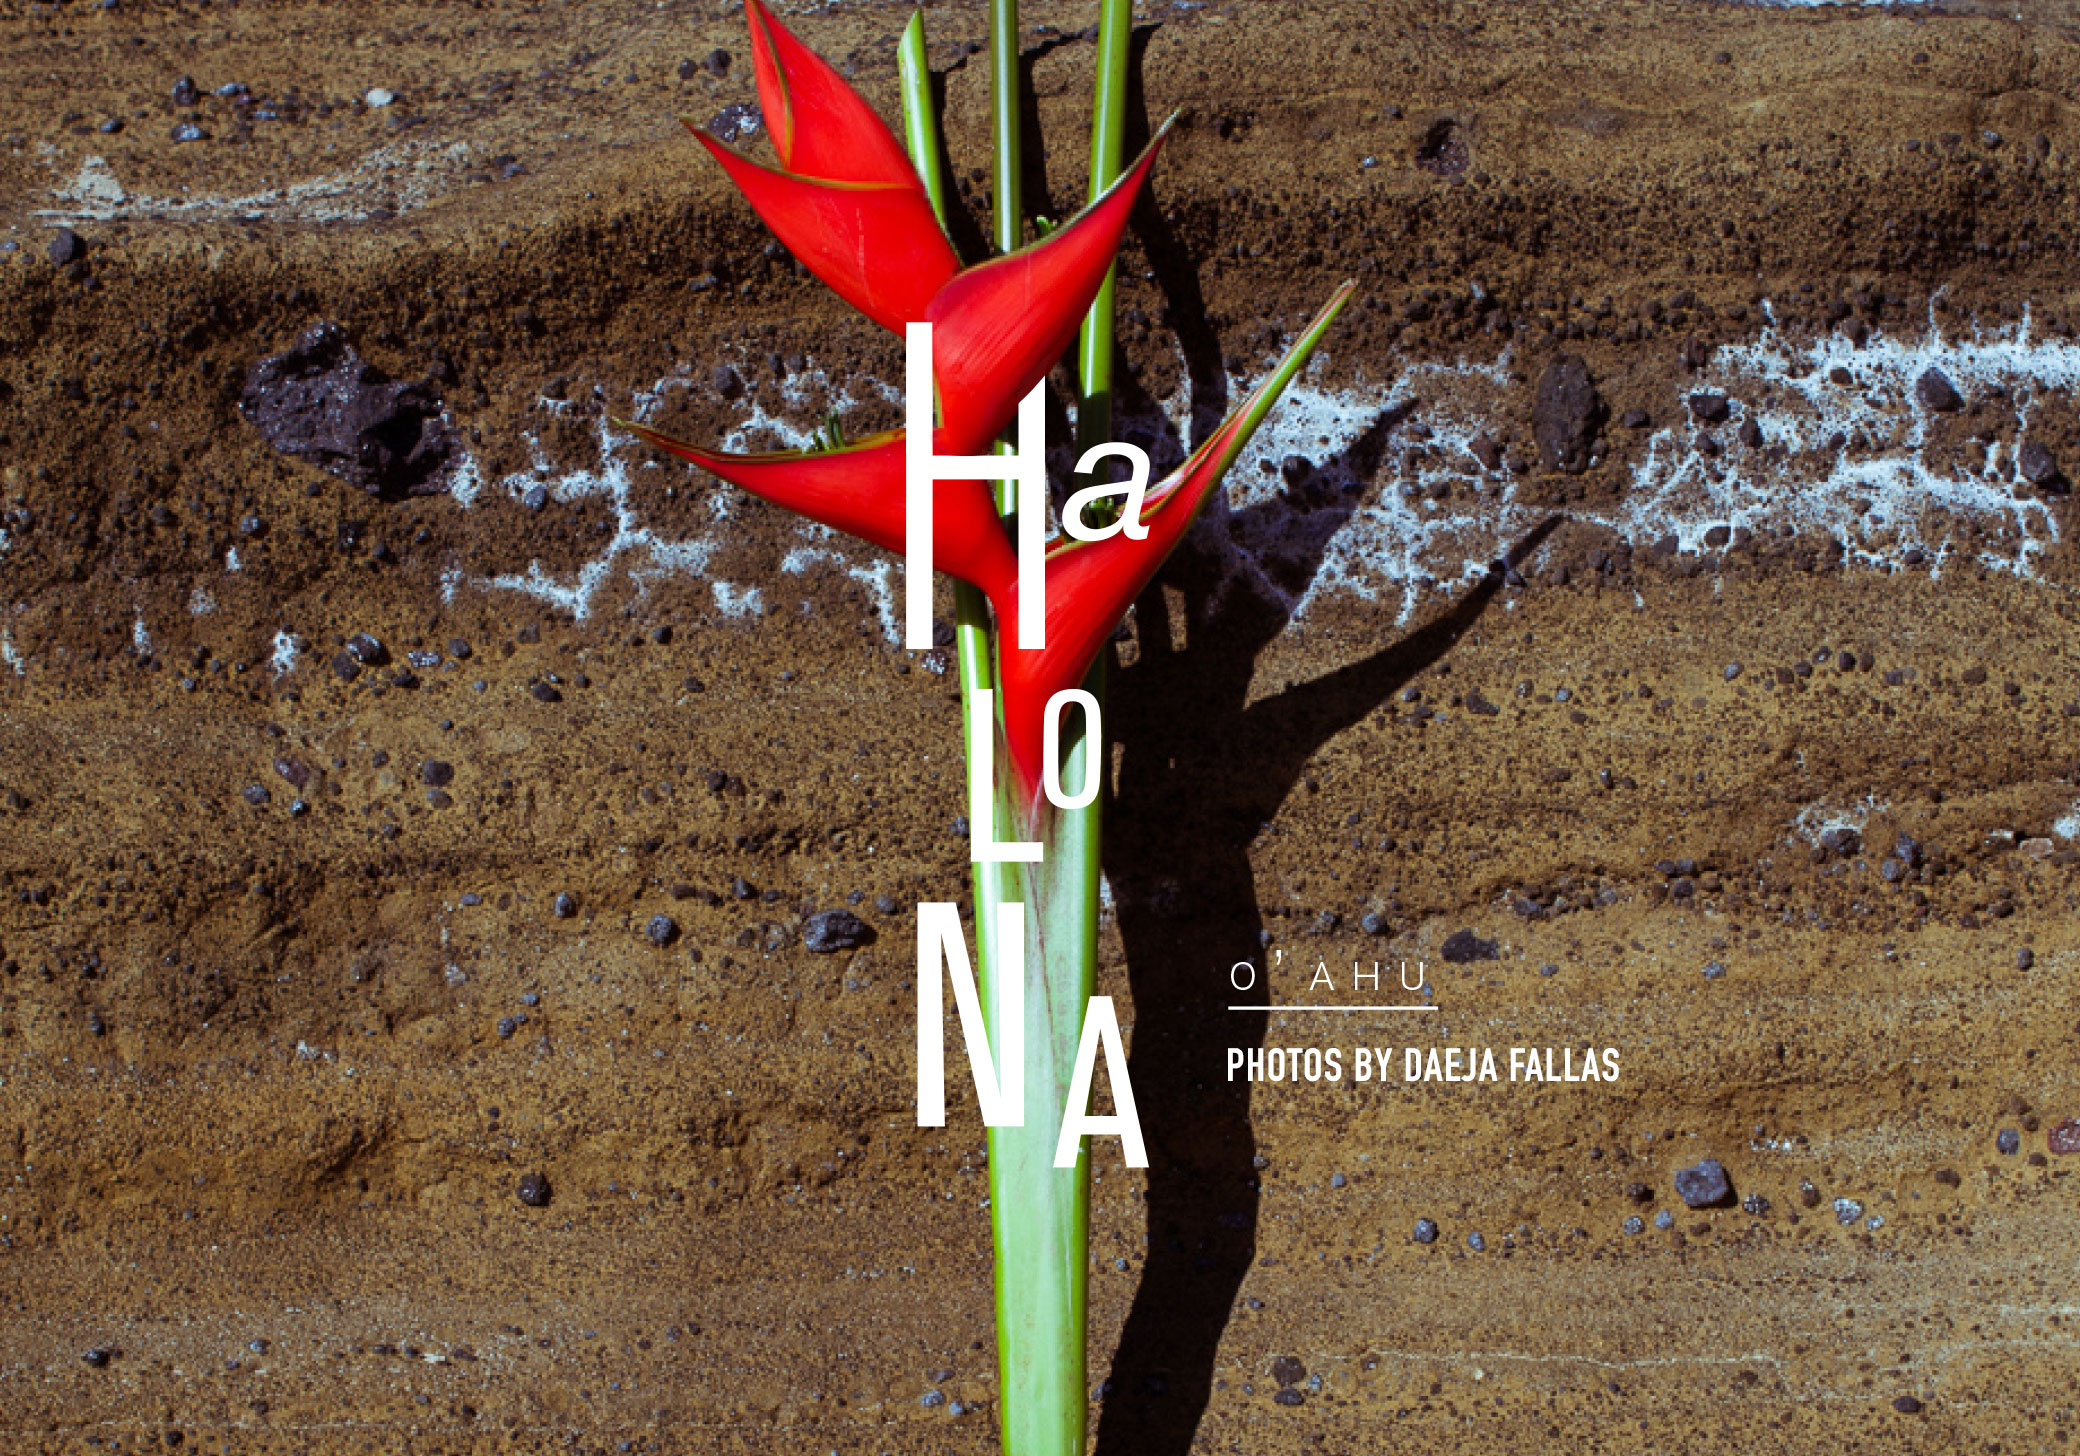 01-tiny-atlas-quarterly-graphic-oahu-daeja-fallas-L.jpg